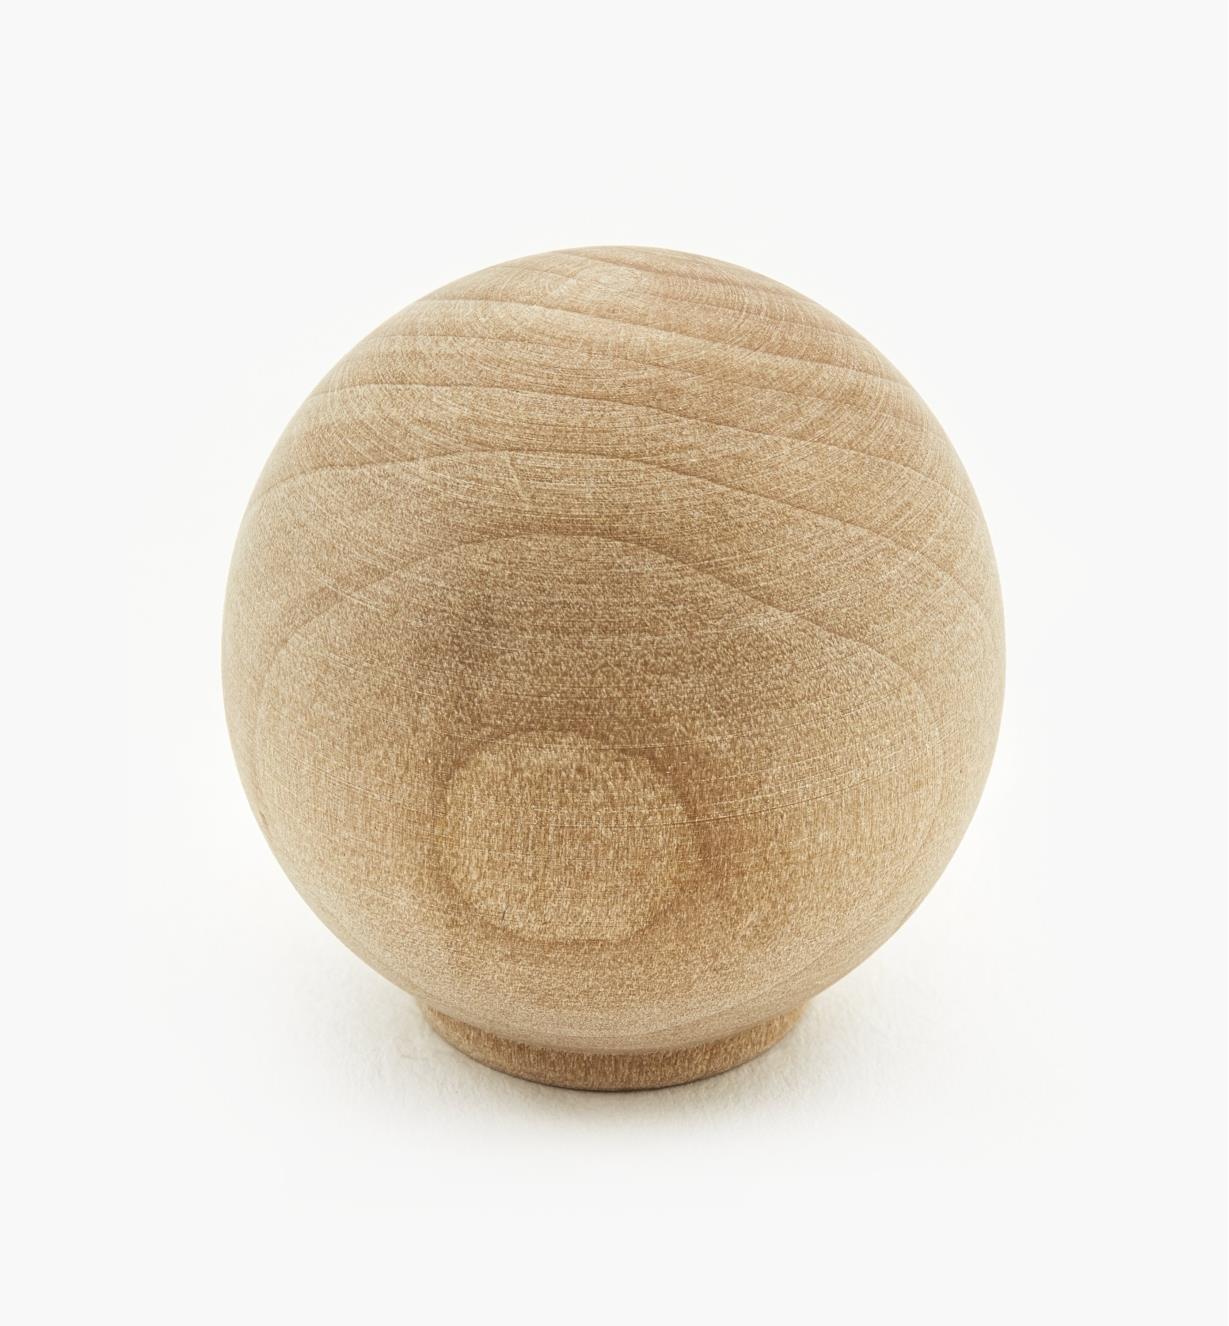 "02G1418 - 1 3/8"" x 1 3/8"" Maple Ball Knob"